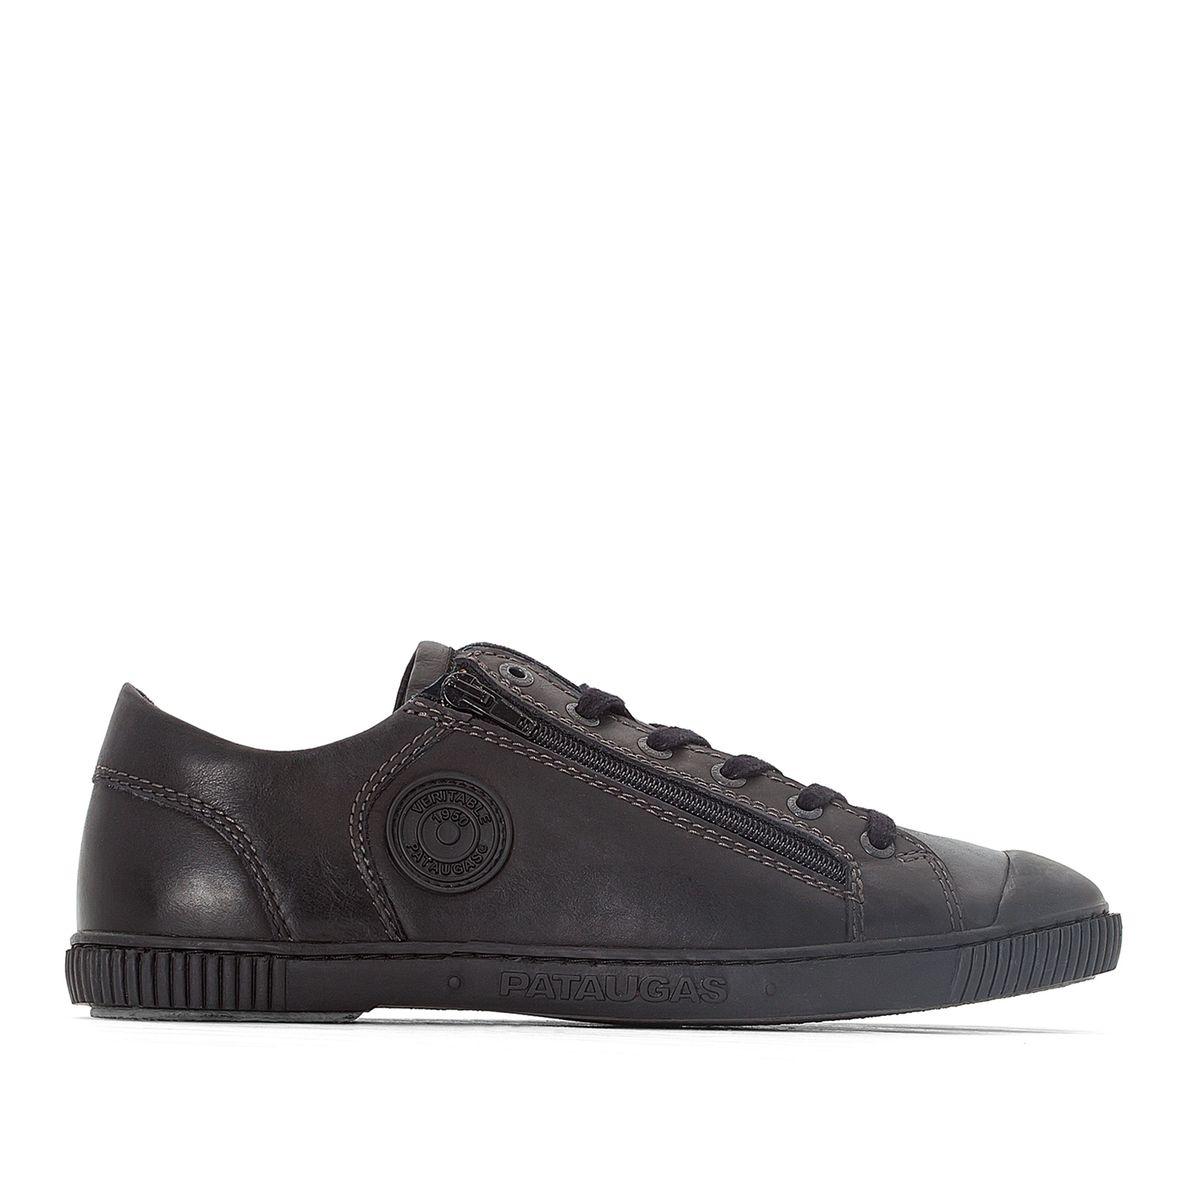 1791 Chaussures Nike En Ligne Air Purity Femme Tea Xwtyqw amp; Presto 4IwXE1nq